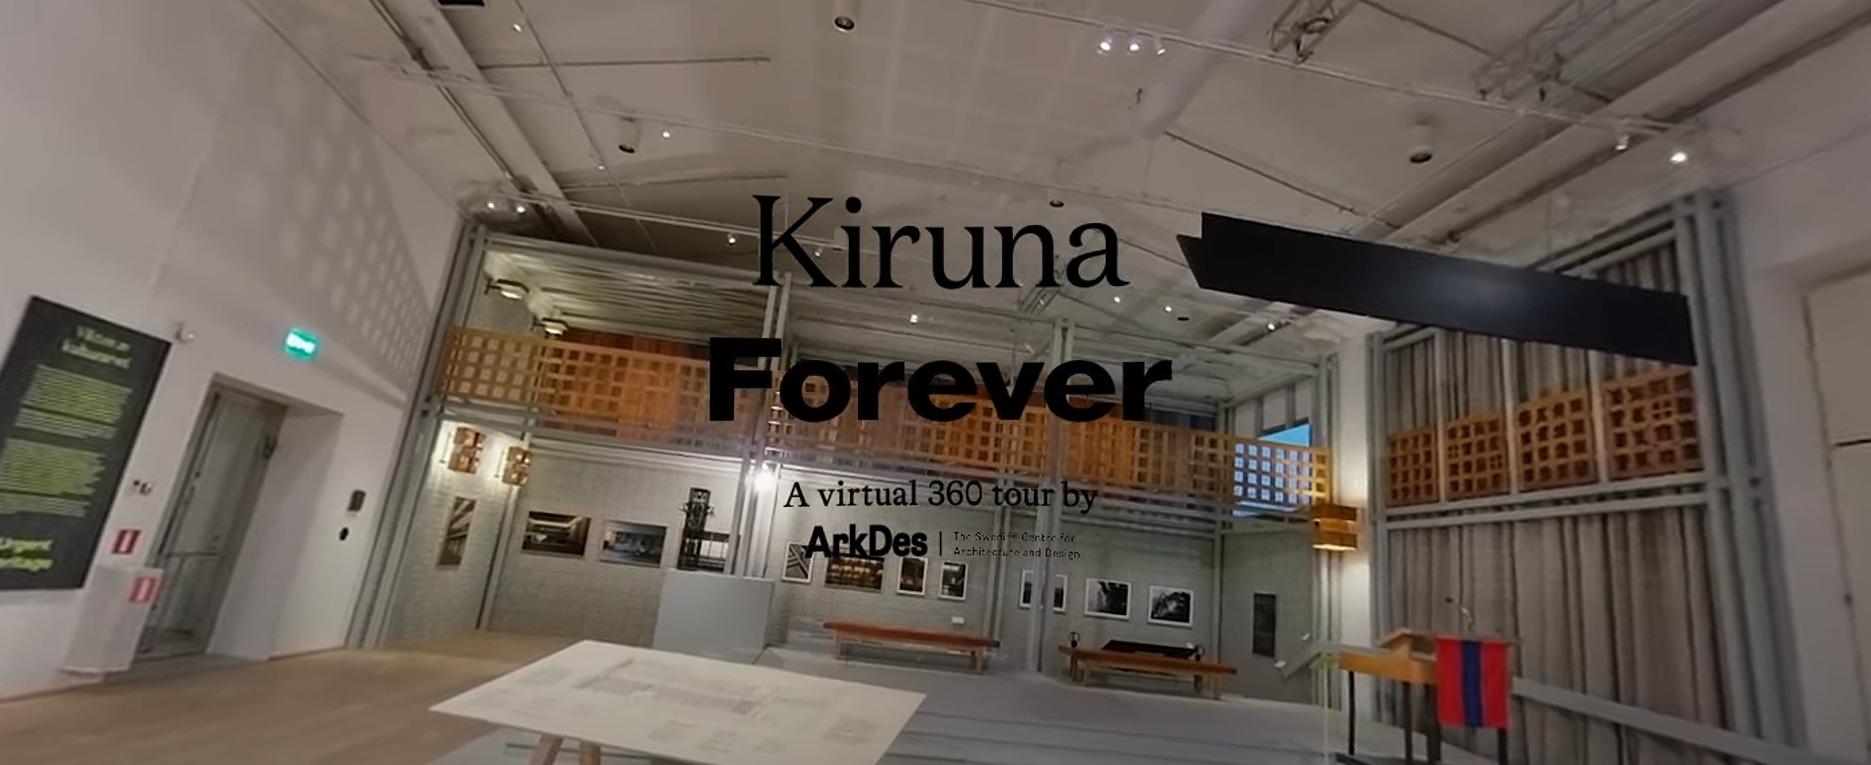 Virtuellt vernissage Kiruna Forever i 360°